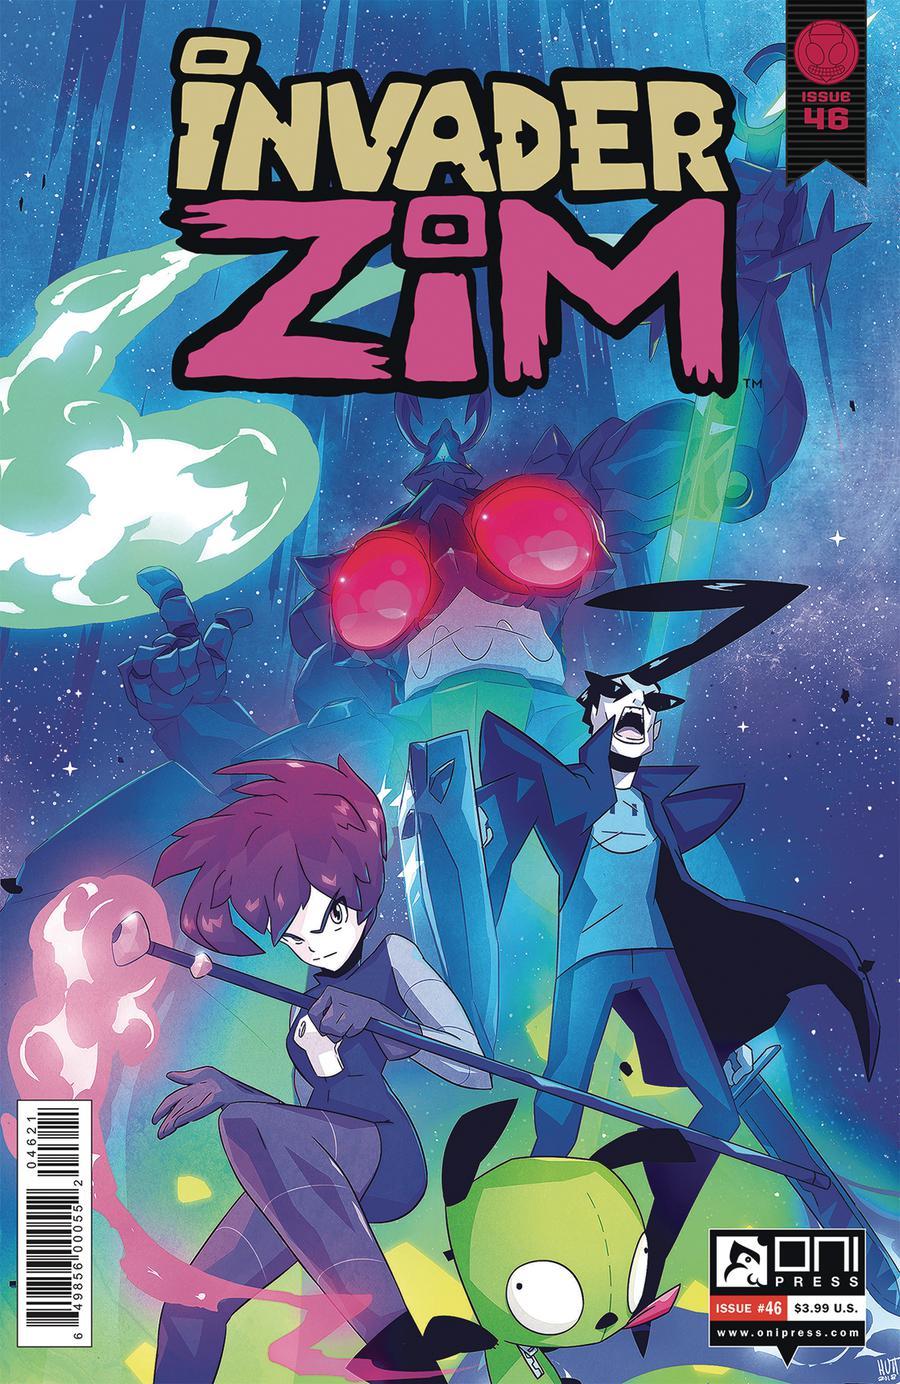 Invader Zim #46 Cover B Variant Simon Troussellier Cover